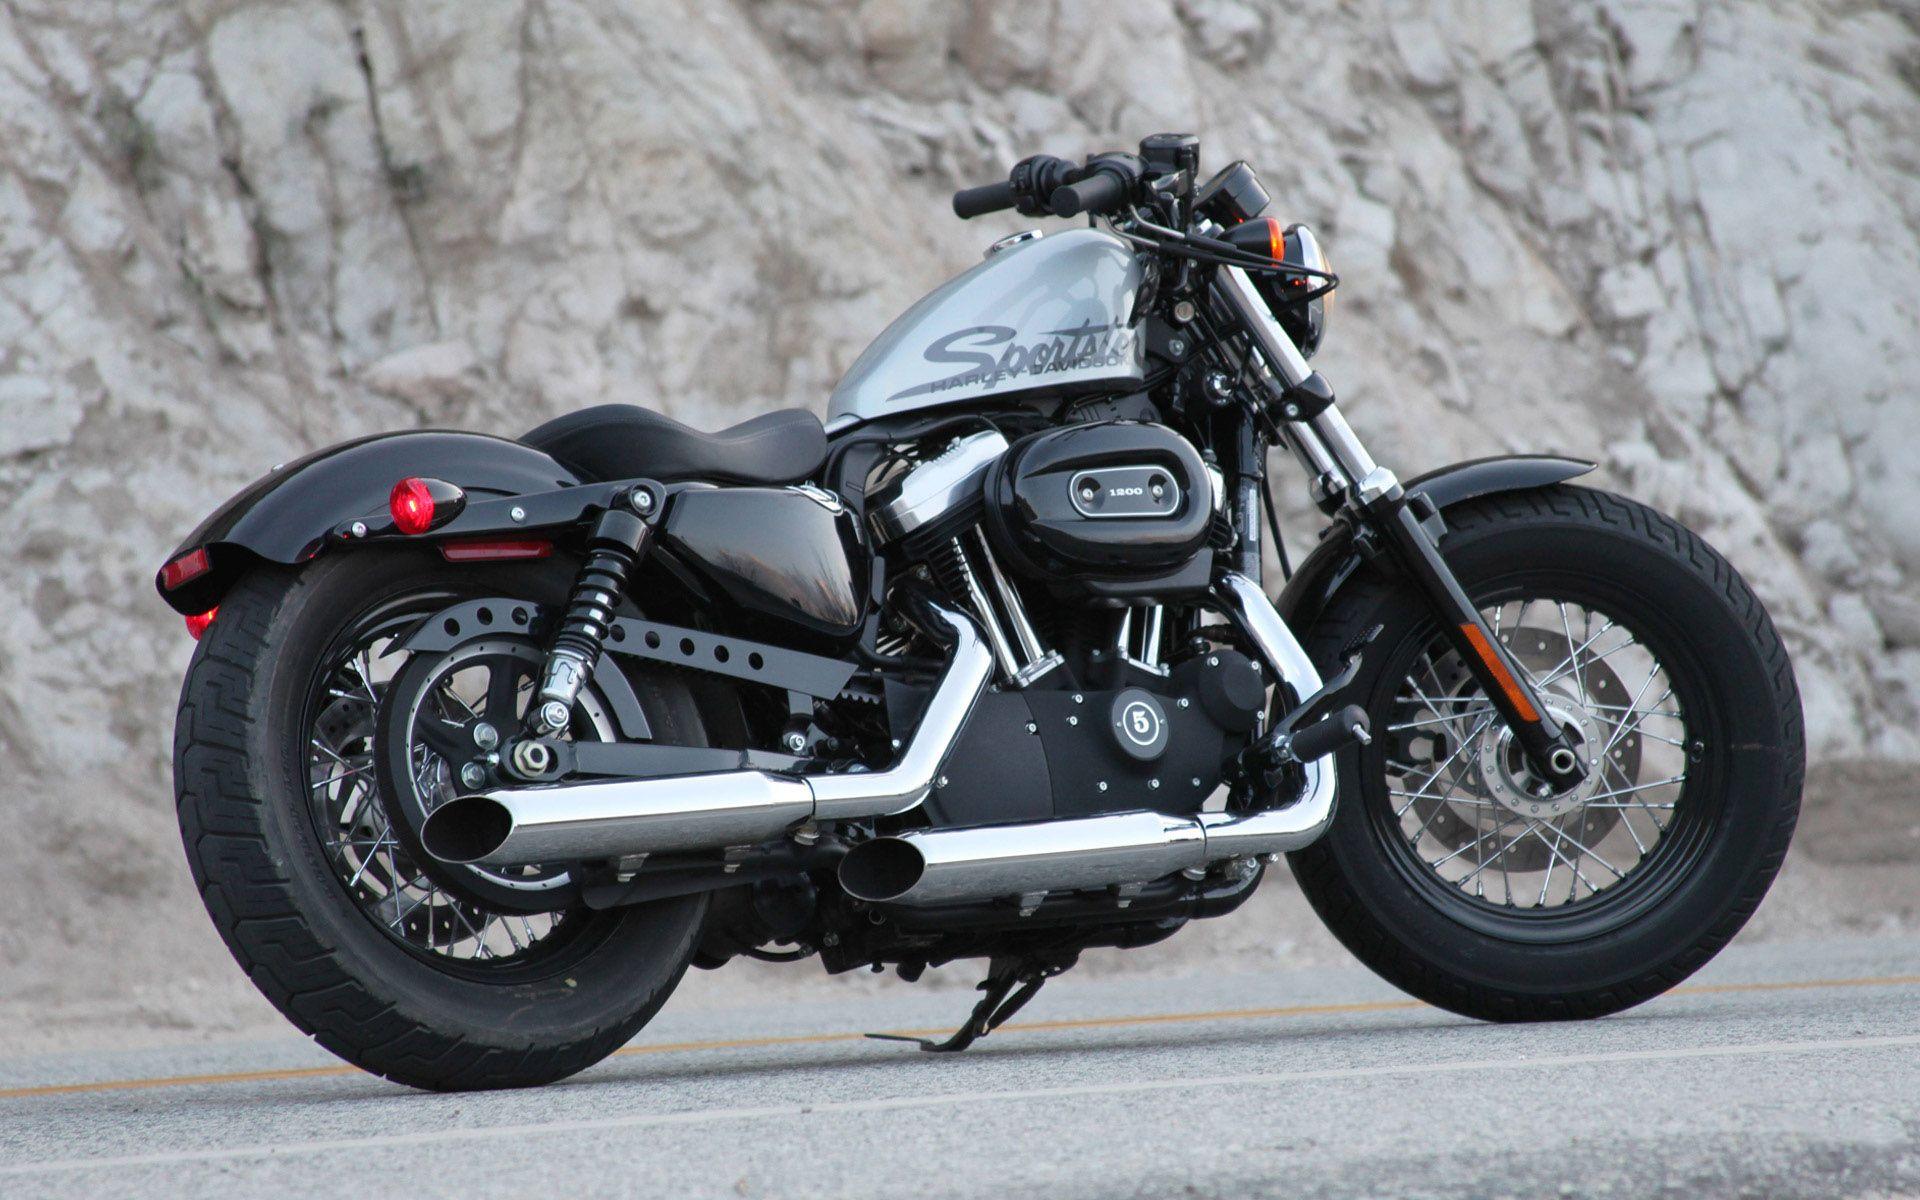 Harley Davidson Sportster Wallpapers For Smartphone Hq Picture Harley Davidson Pictures Harley Davidson Wallpaper Harley Davidson Roadster